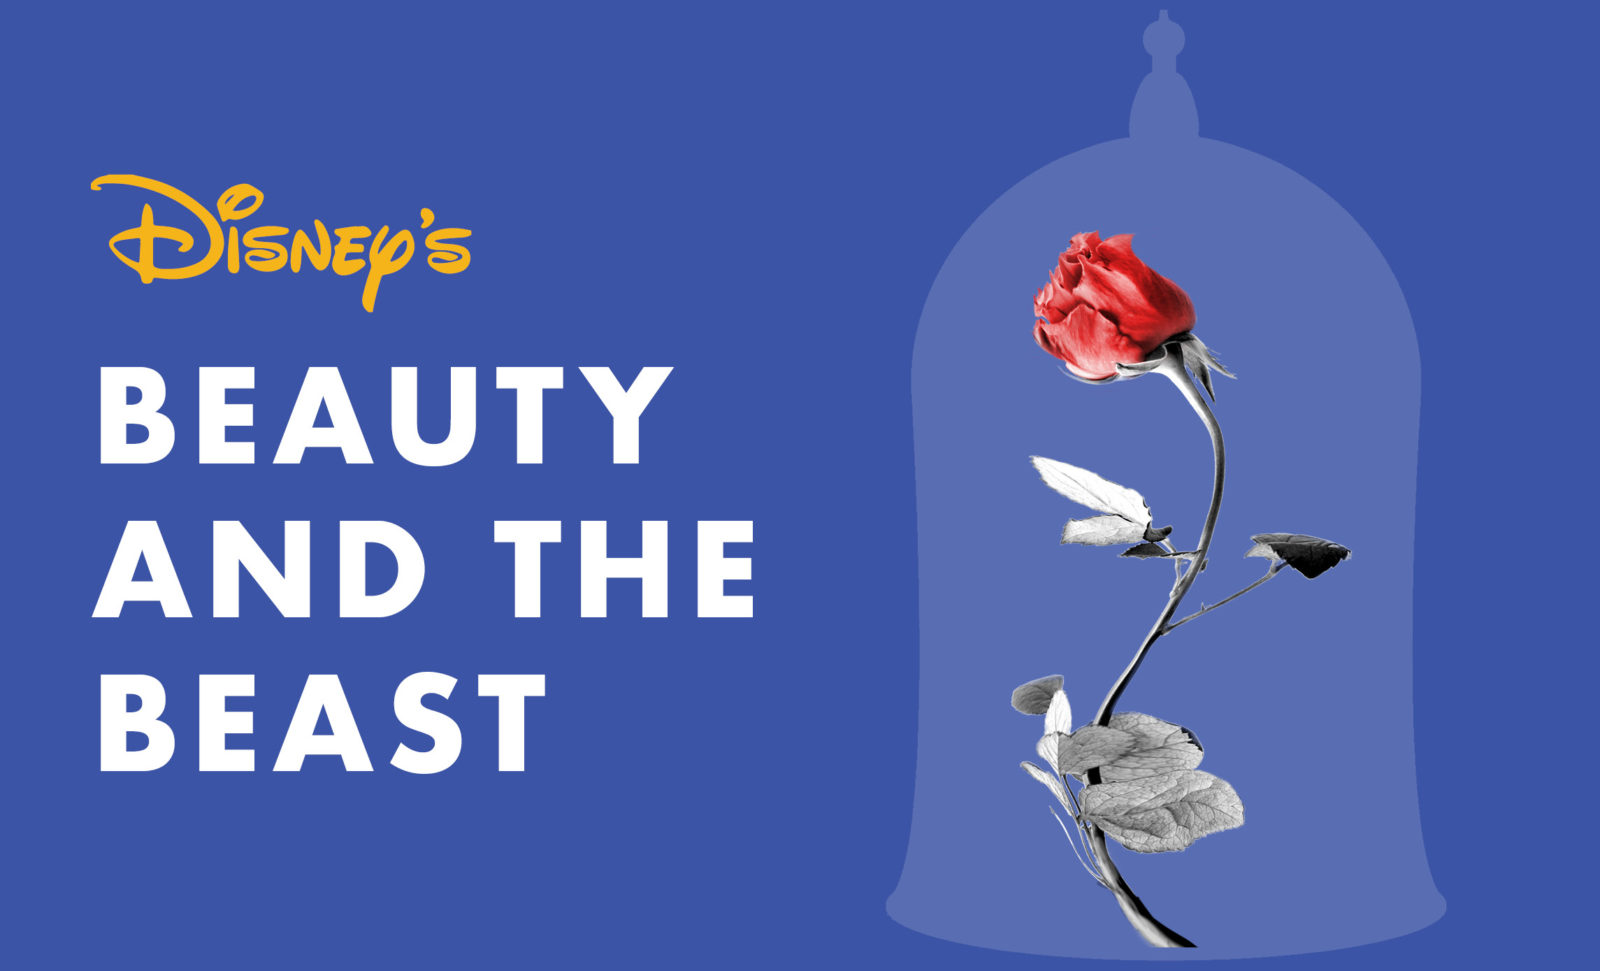 Disneys beauty and the beast norshor theatre izmirmasajfo